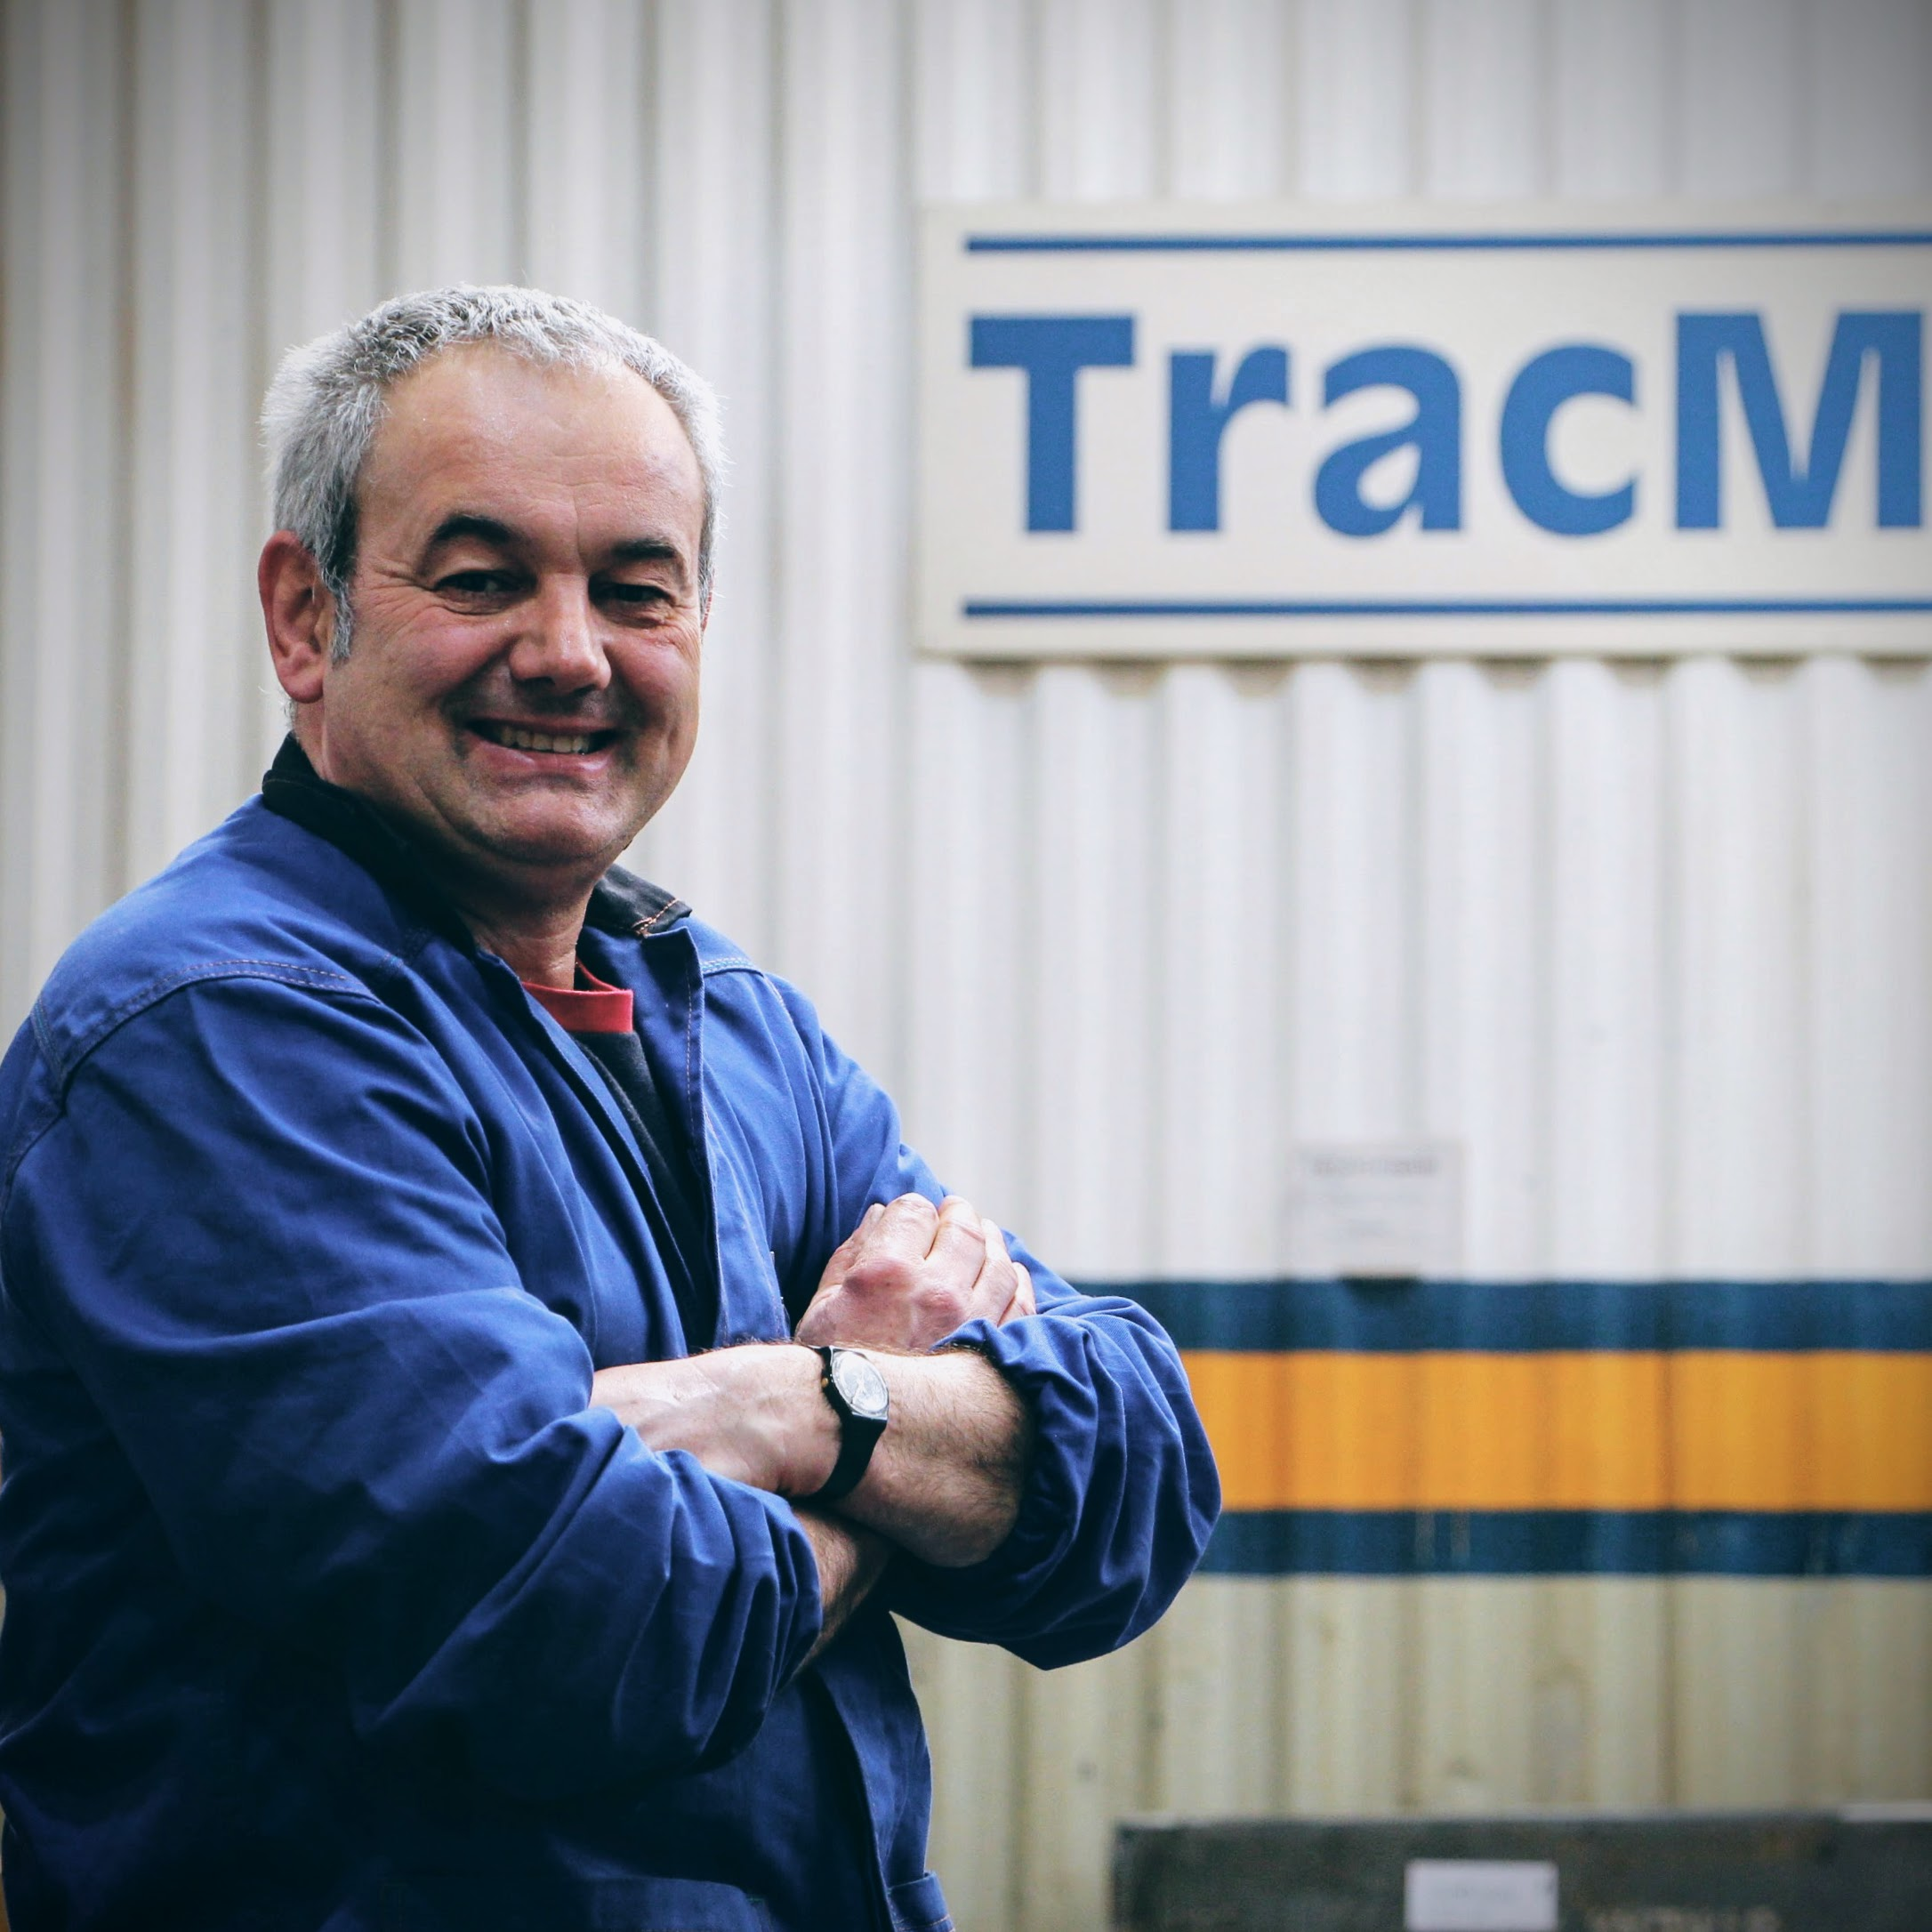 TracMec Staff